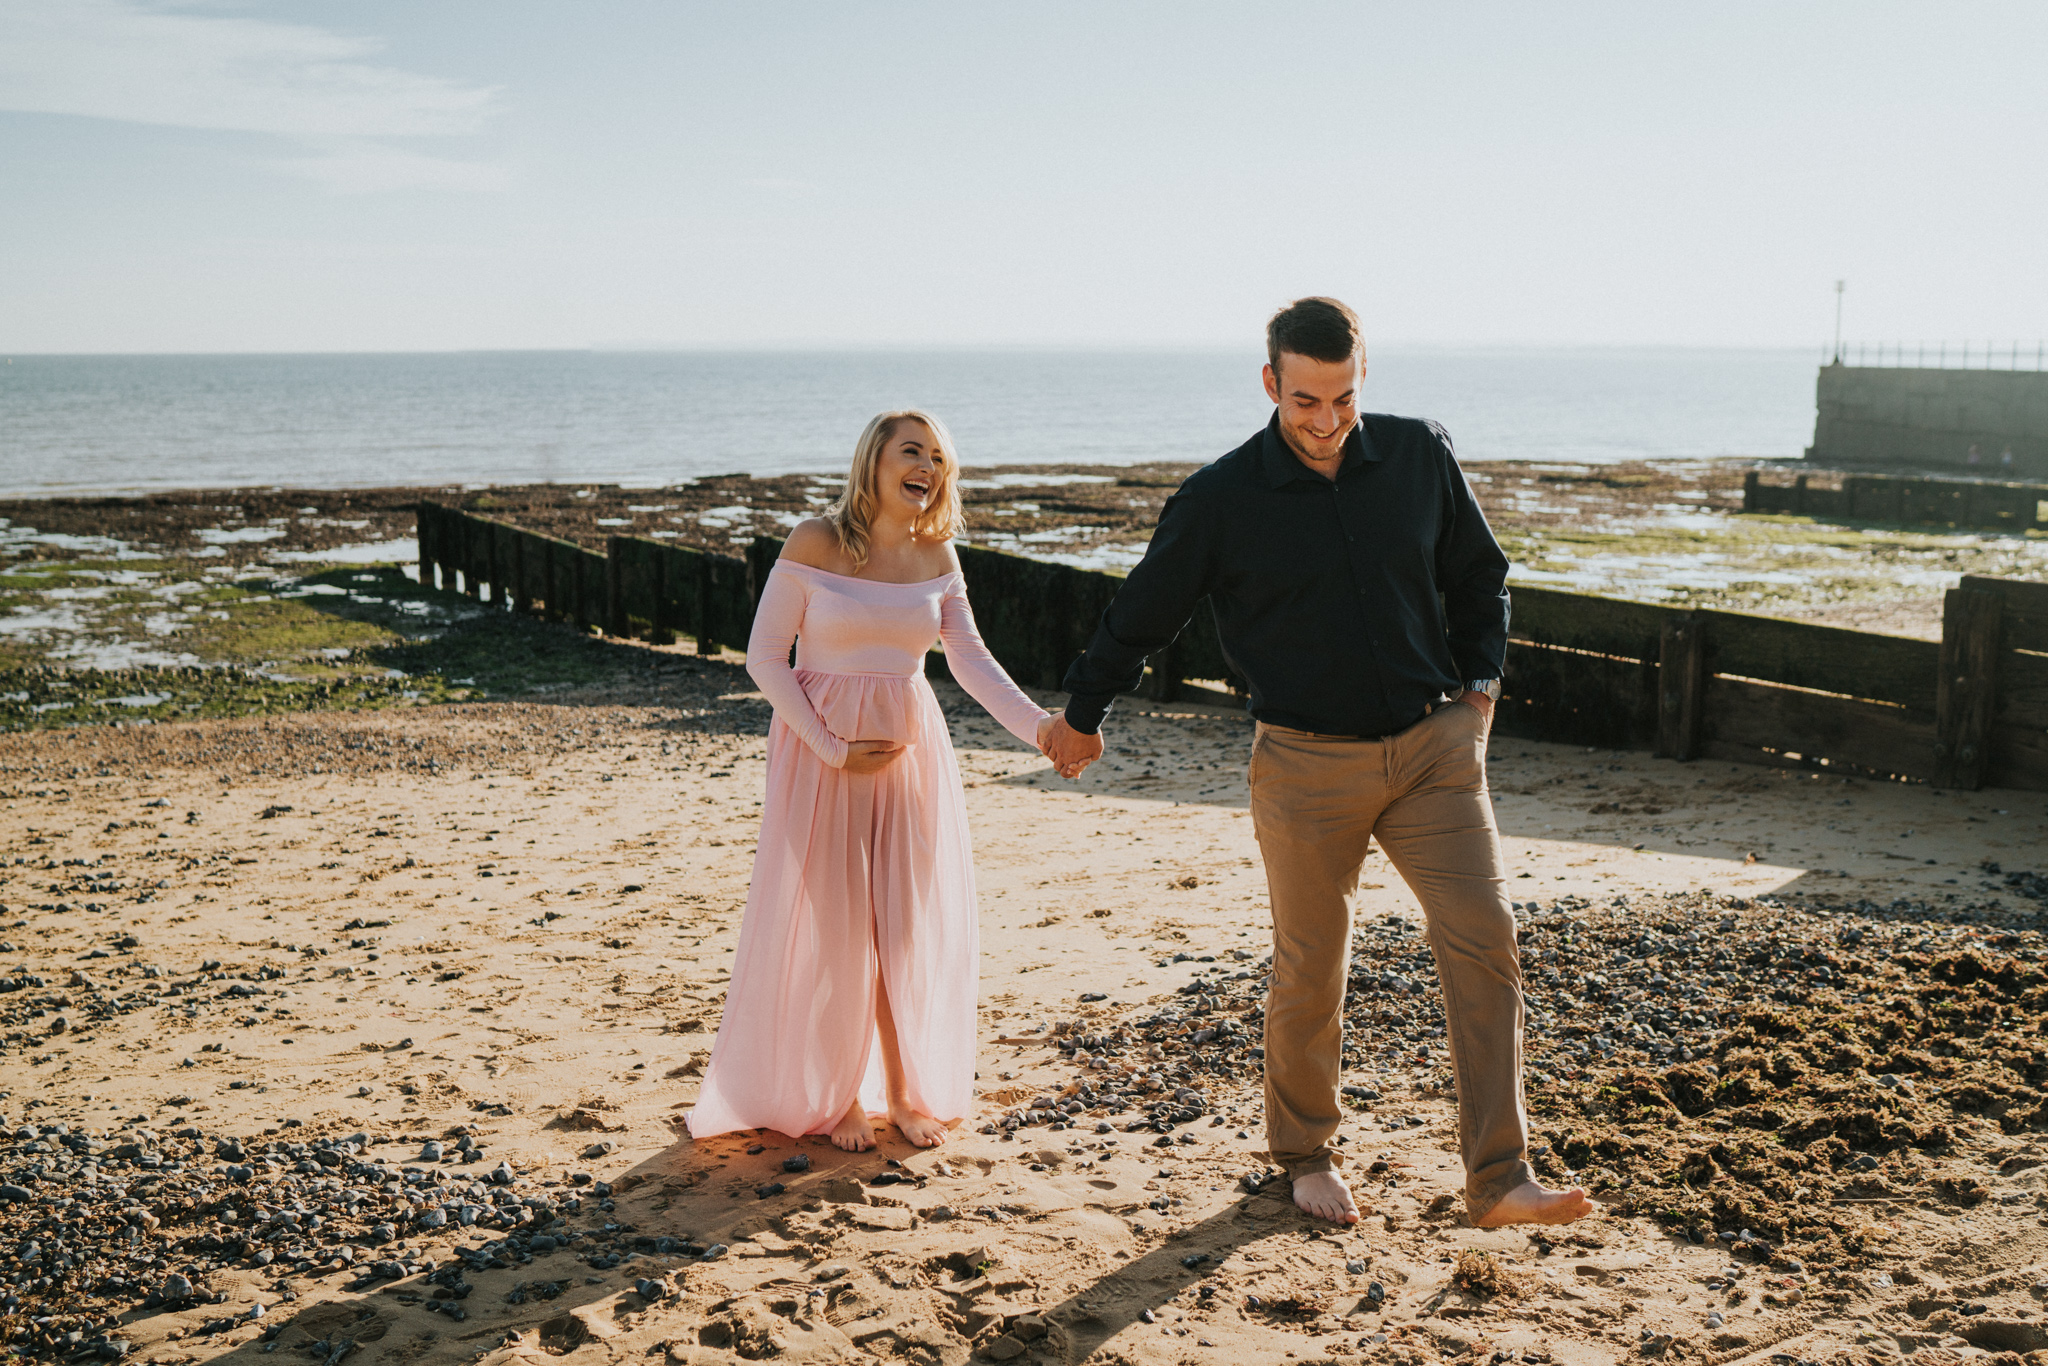 Jess-Maternity-Photography-Grace-Elizabeth-Alternative-Essex-Wedding-Lifestyle-Photographer-Colchester-Essex-Suffolk-Norfolk-Devon (3 of 3).jpg